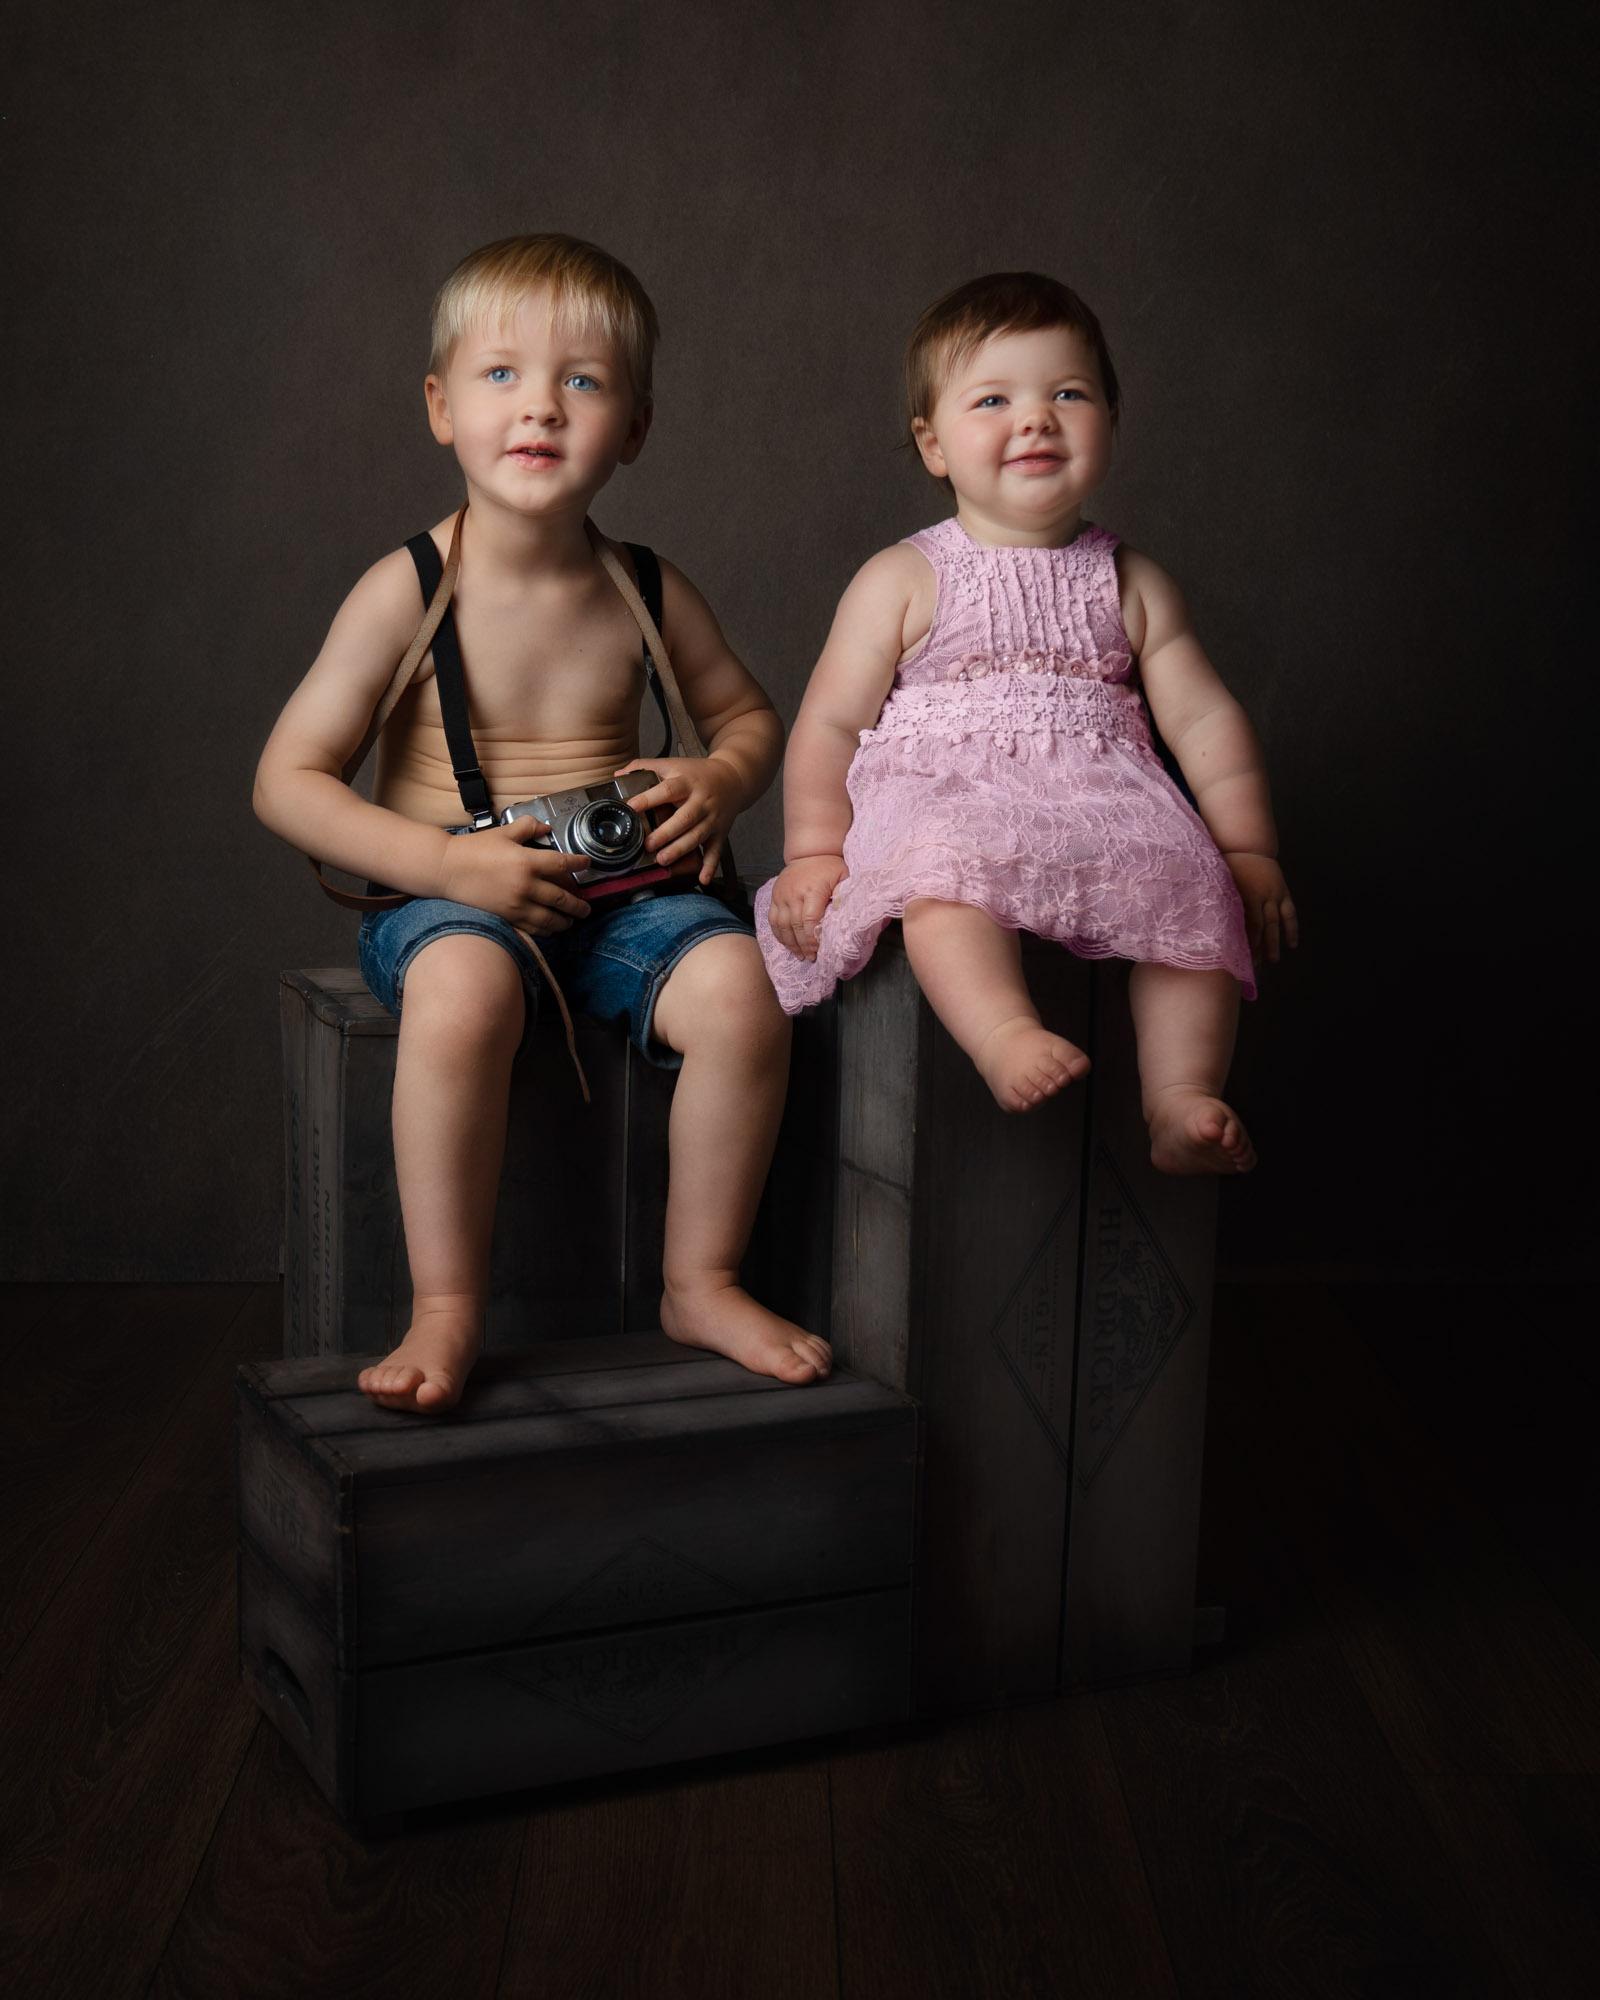 lisa-scott-photography-88